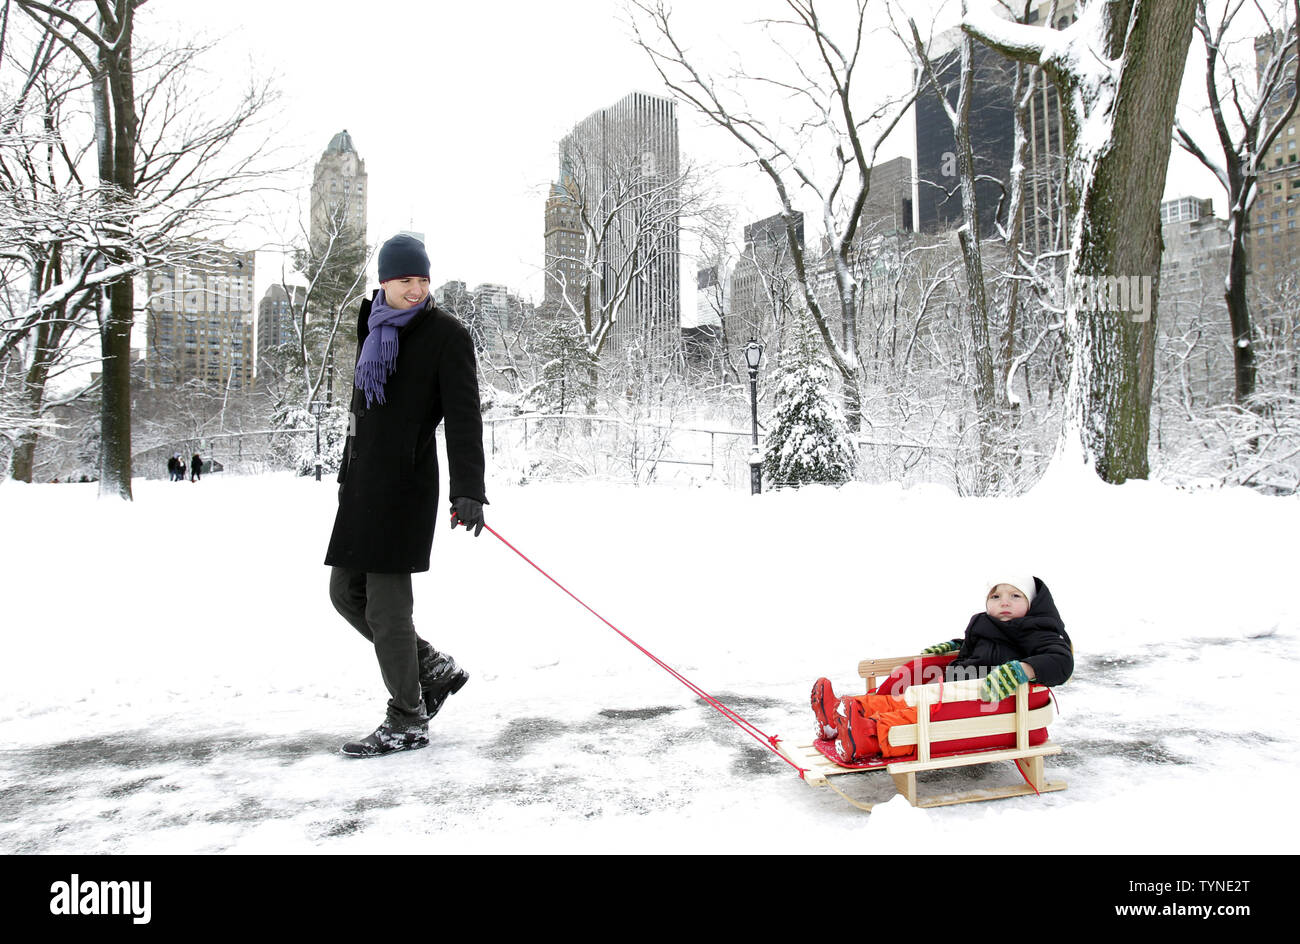 A man pulls a child through Central Park after winter storm